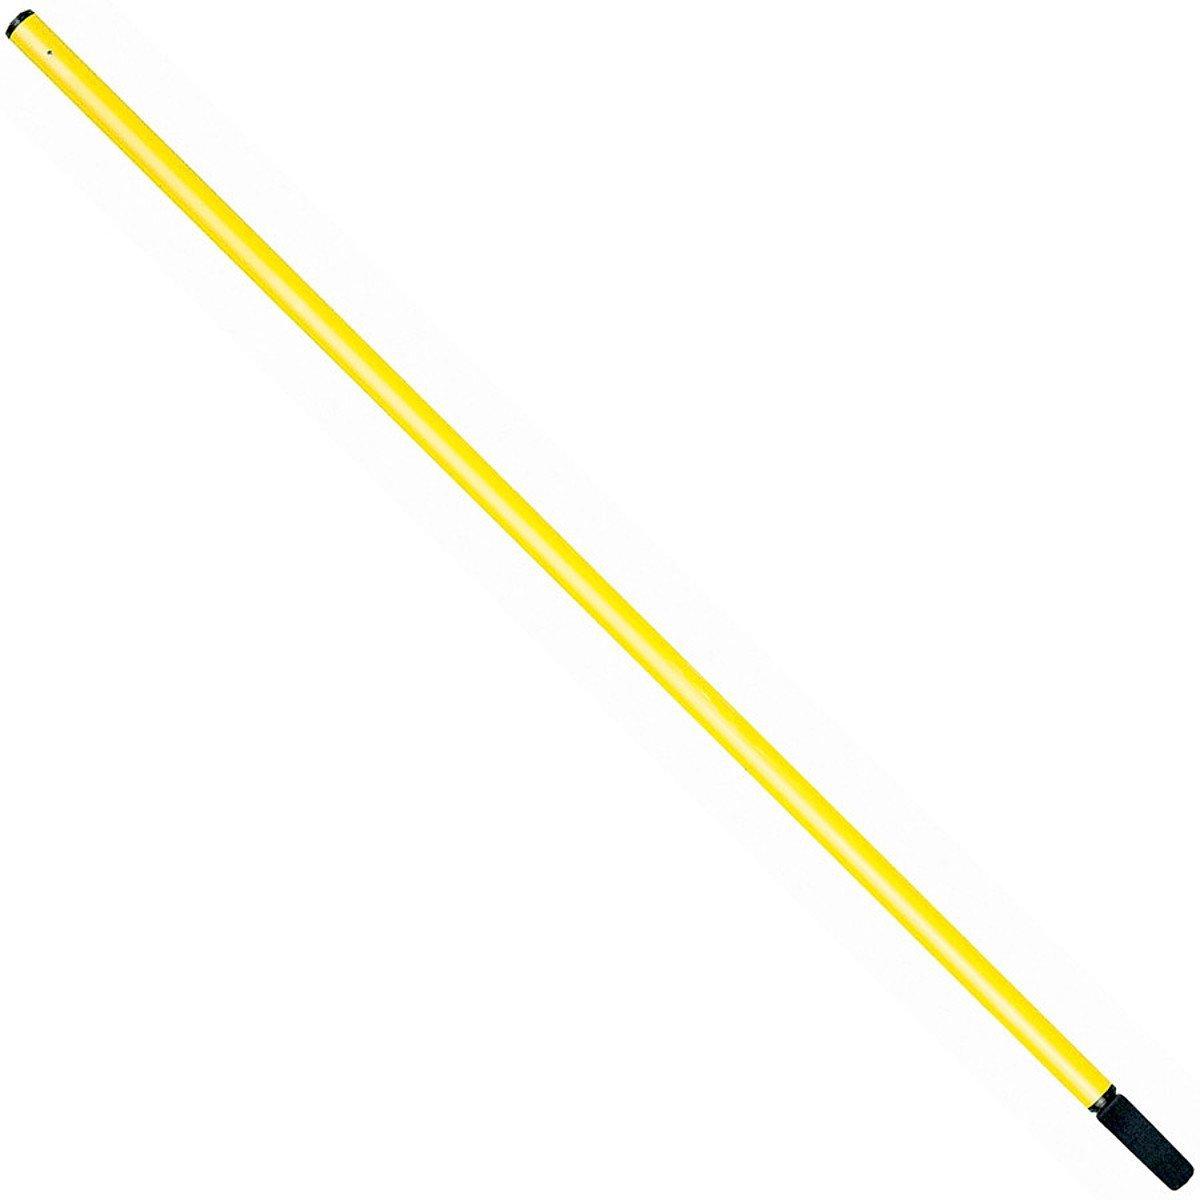 Carlisle Exhd Raft Oar Shaft 9.5 Yellow, by Carlisle